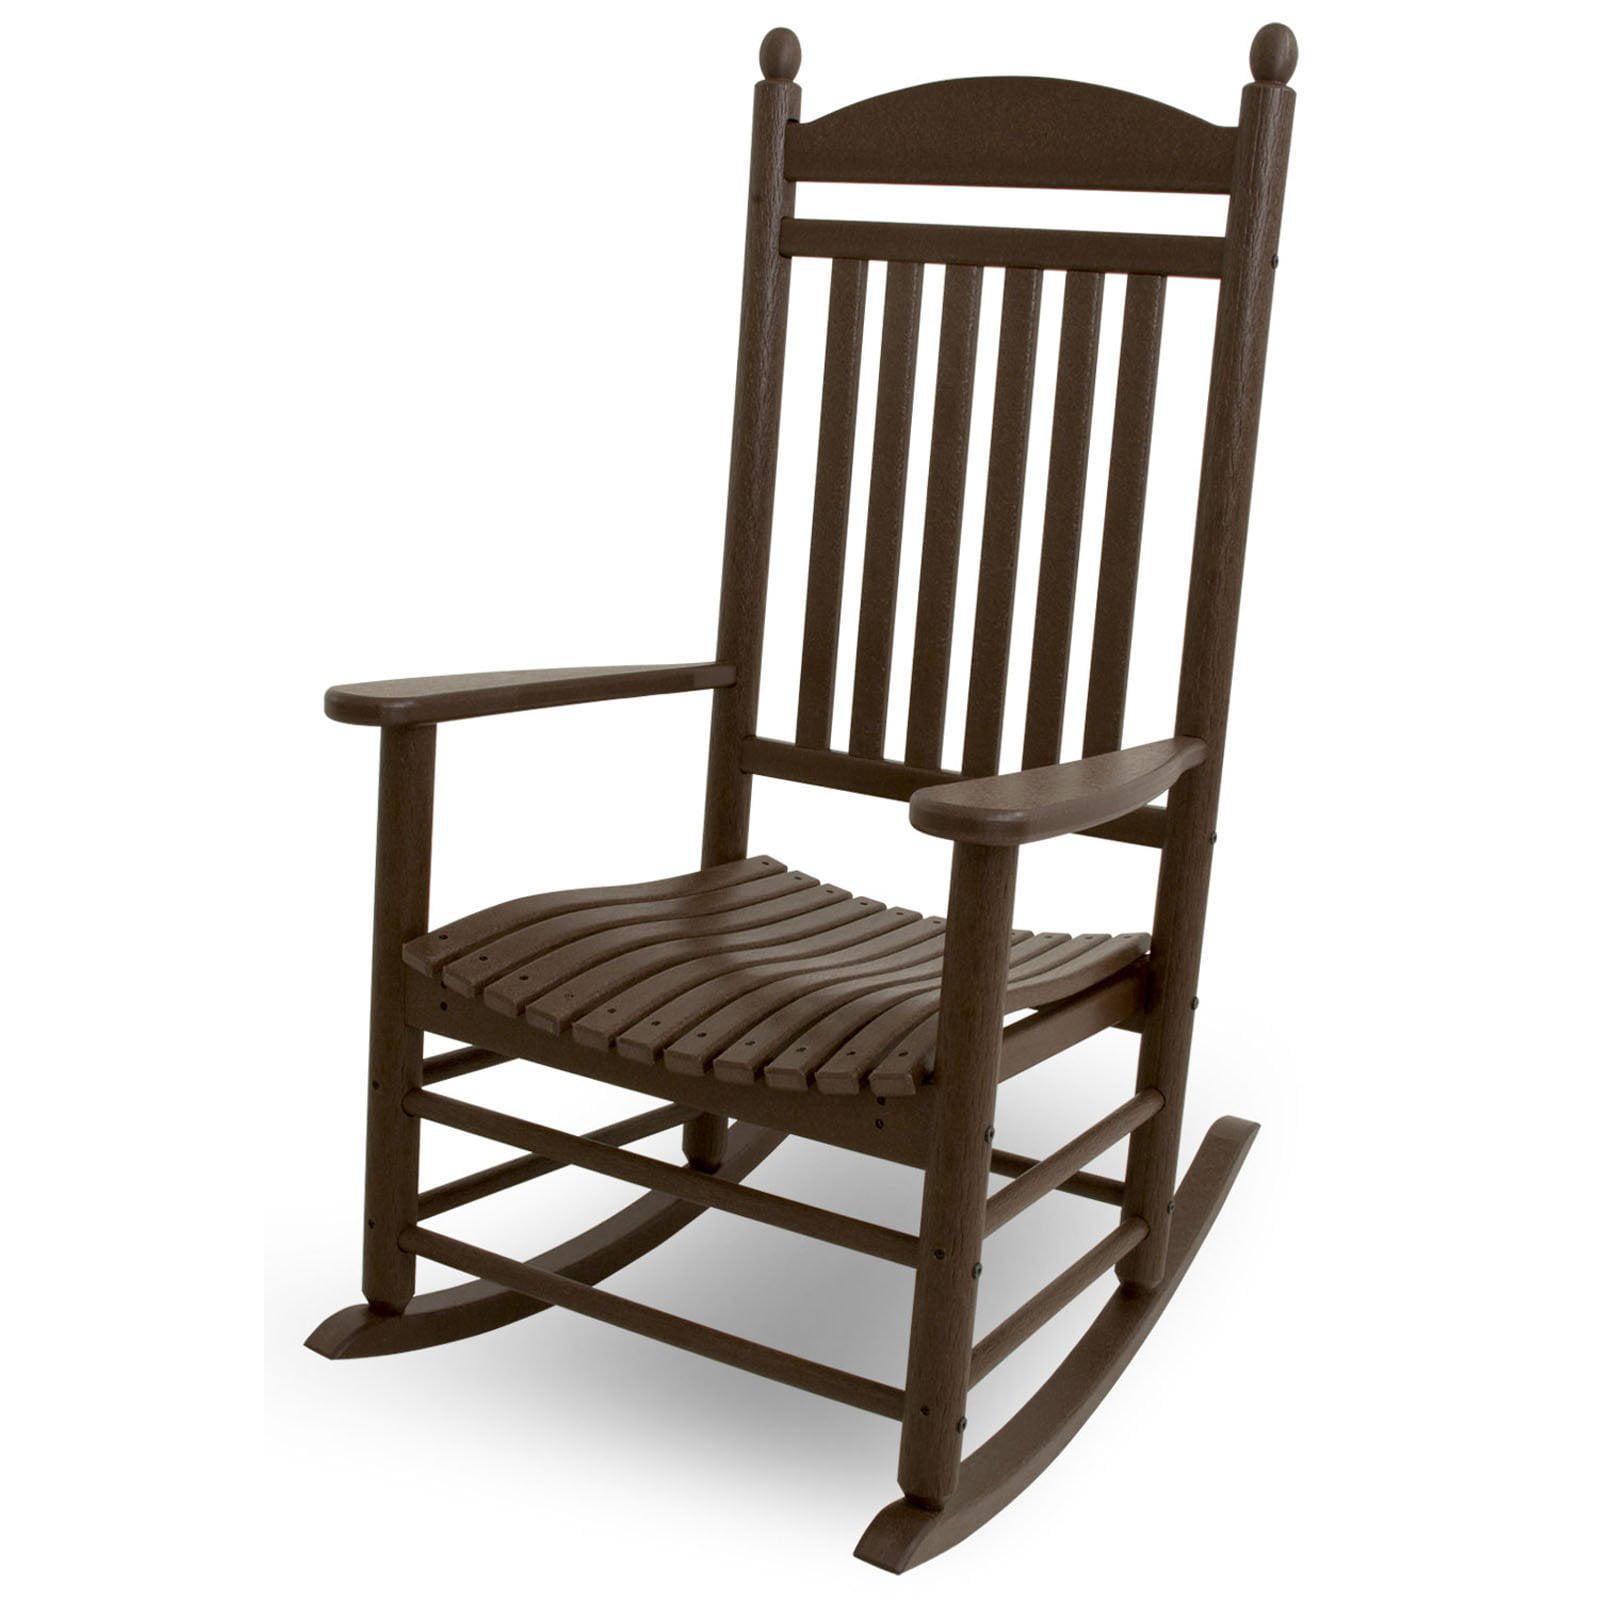 POLYWOOD Jefferson Recycled Plastic Rocking Chair Walmart